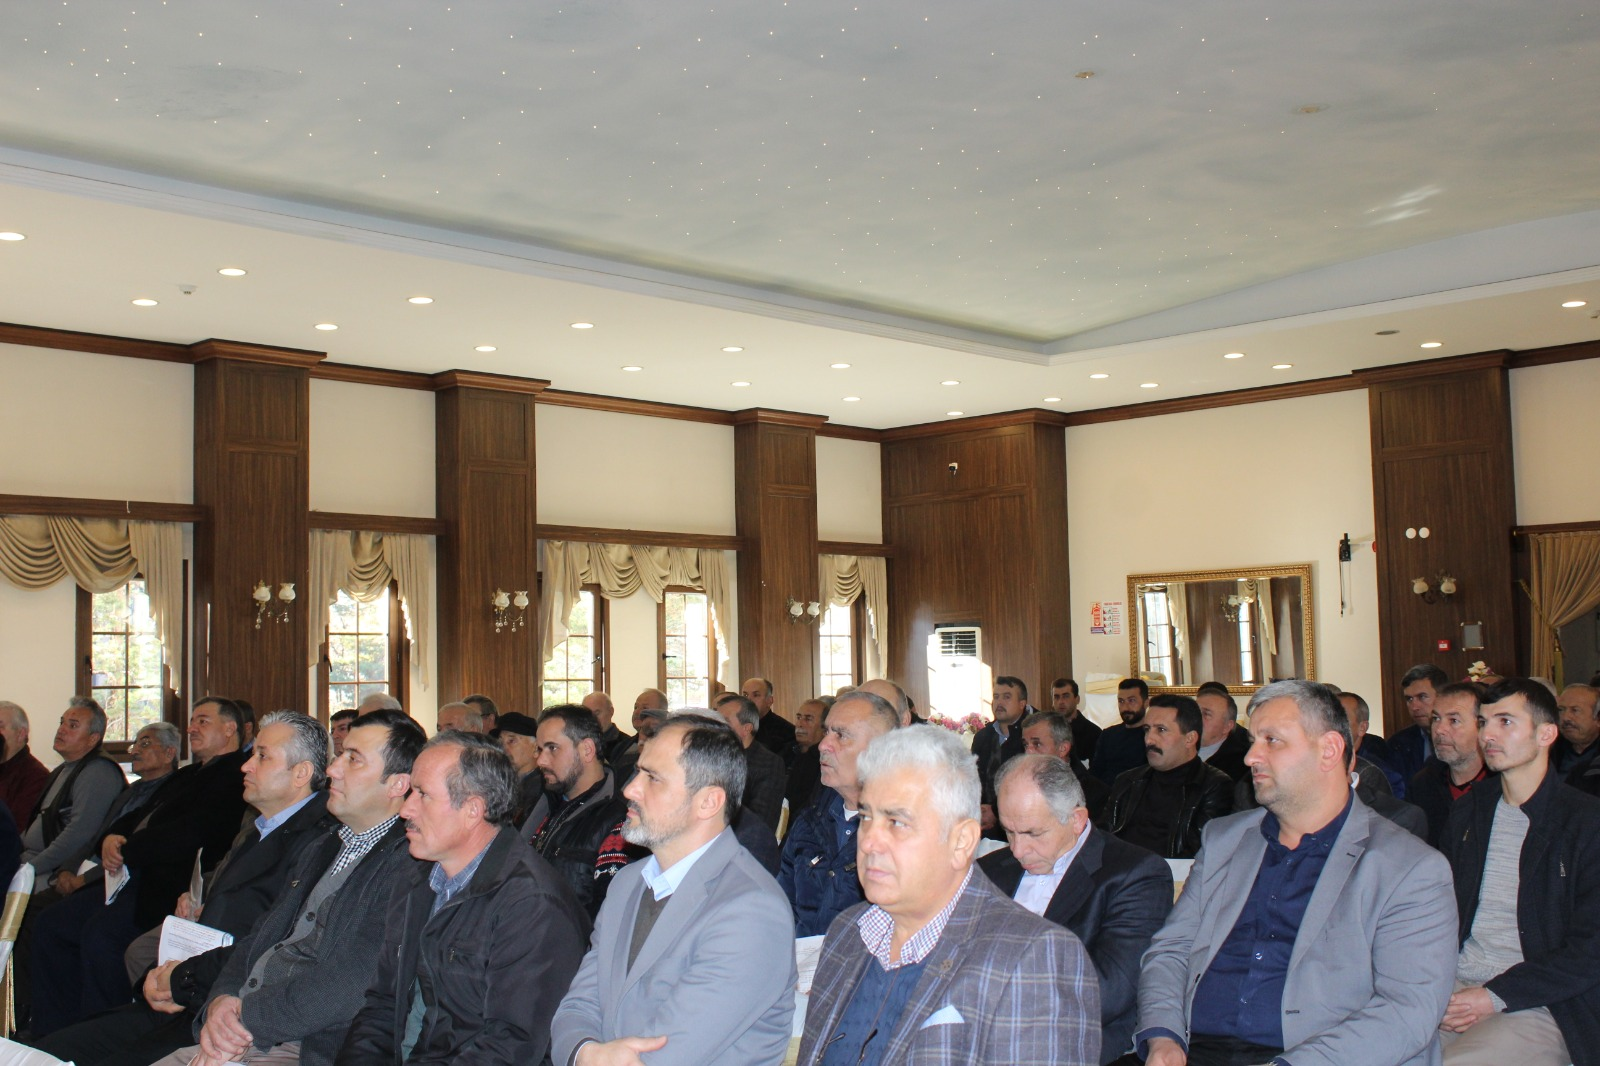 http://www.safranbolu.gov.tr/kurumlar/safranbolu.gov.tr/galeri/2019-aralik-muh-top/WhatsApp-Image-2019_12_17-at-141706.jpeg